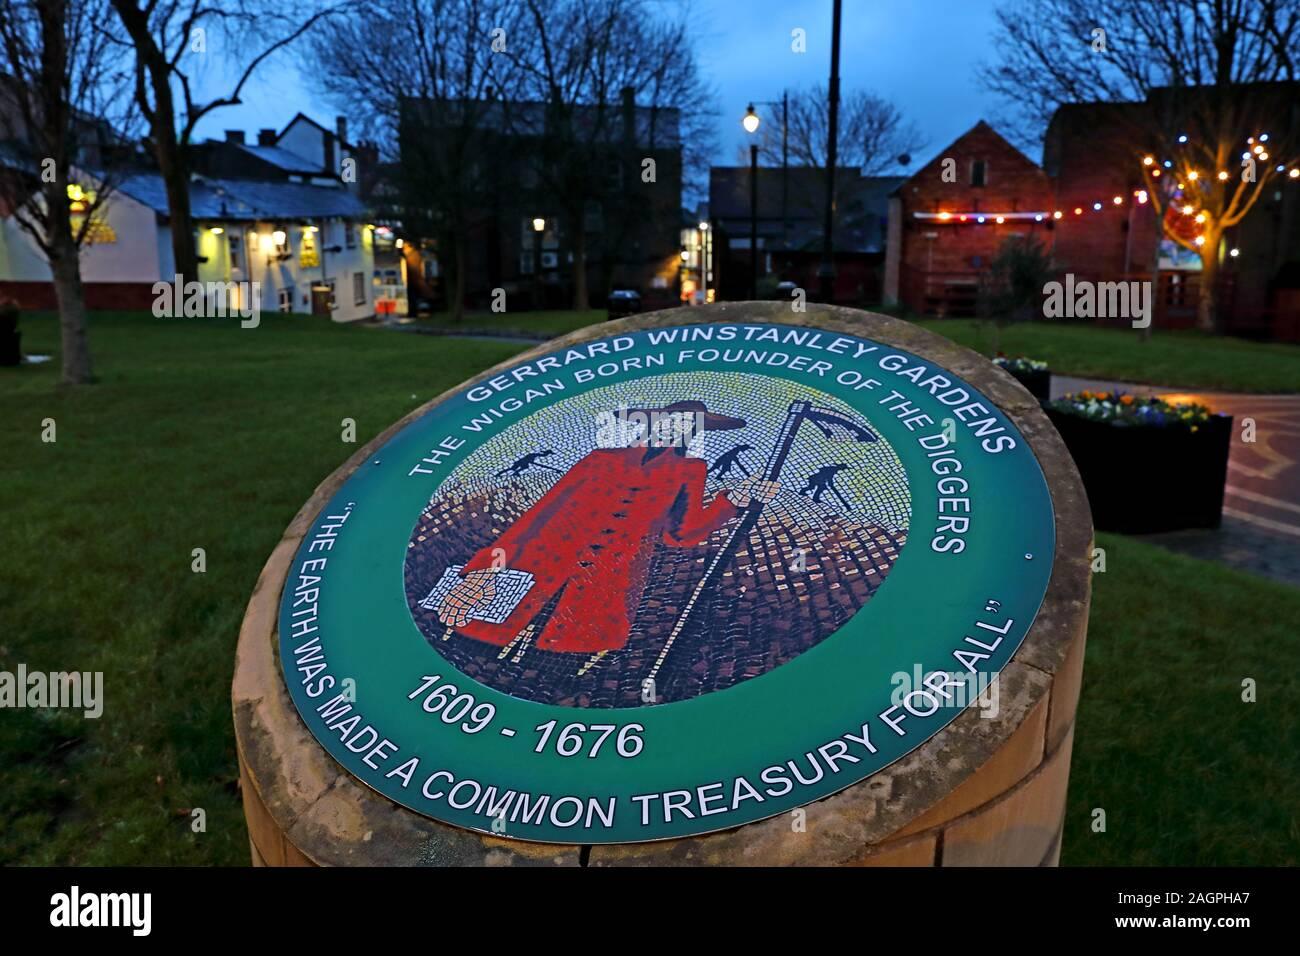 HotpixUK,@HotpixUK,GoTonySmith,town centre,art,Greater Manchester,England,UK,WN1 1YB,Manchester,night,Wiend,The Wiend,at night,Marylebone,Wigan Council,artworks,art-works,public art,sculptured,sculptured portrait,portrait,Winstanley,monument,Gerrard Winstanley Gardens,1609,1676,reform,garden,gardens